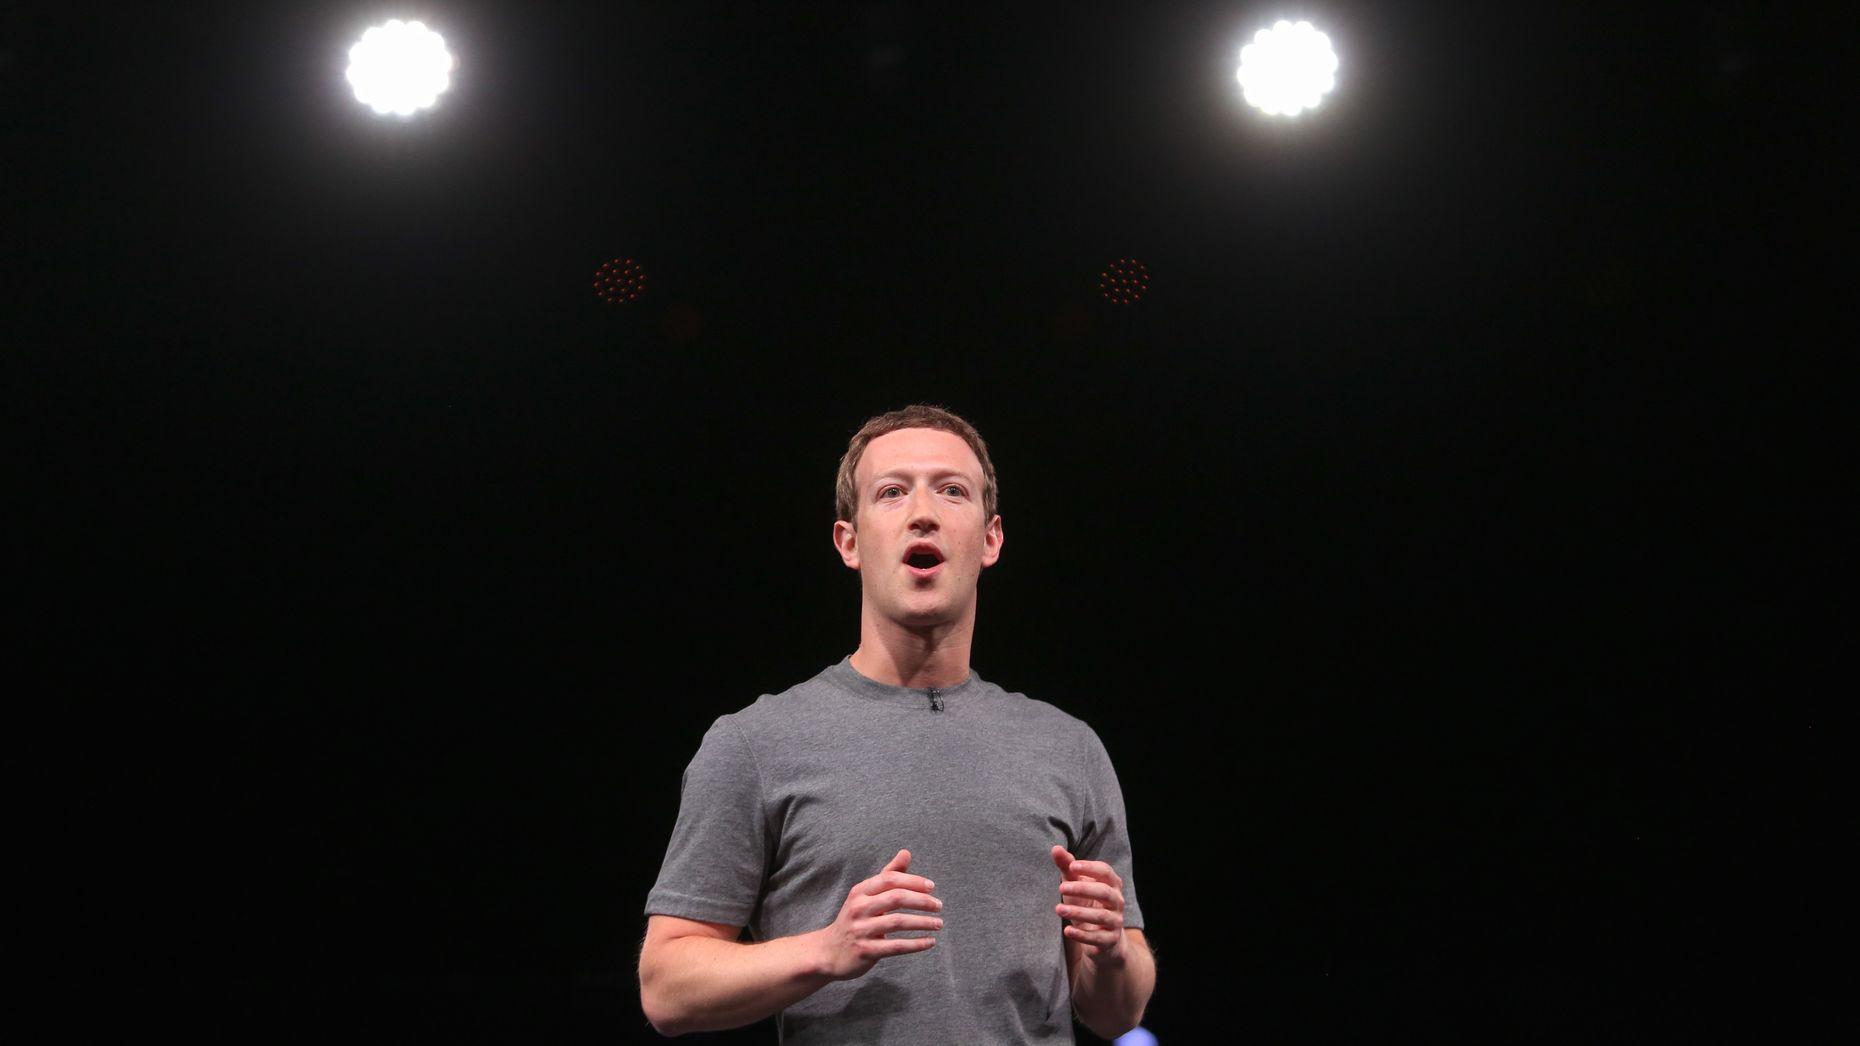 Mark Zuckerberg. Photo by Bloomberg. Art by Dustin Rogers.